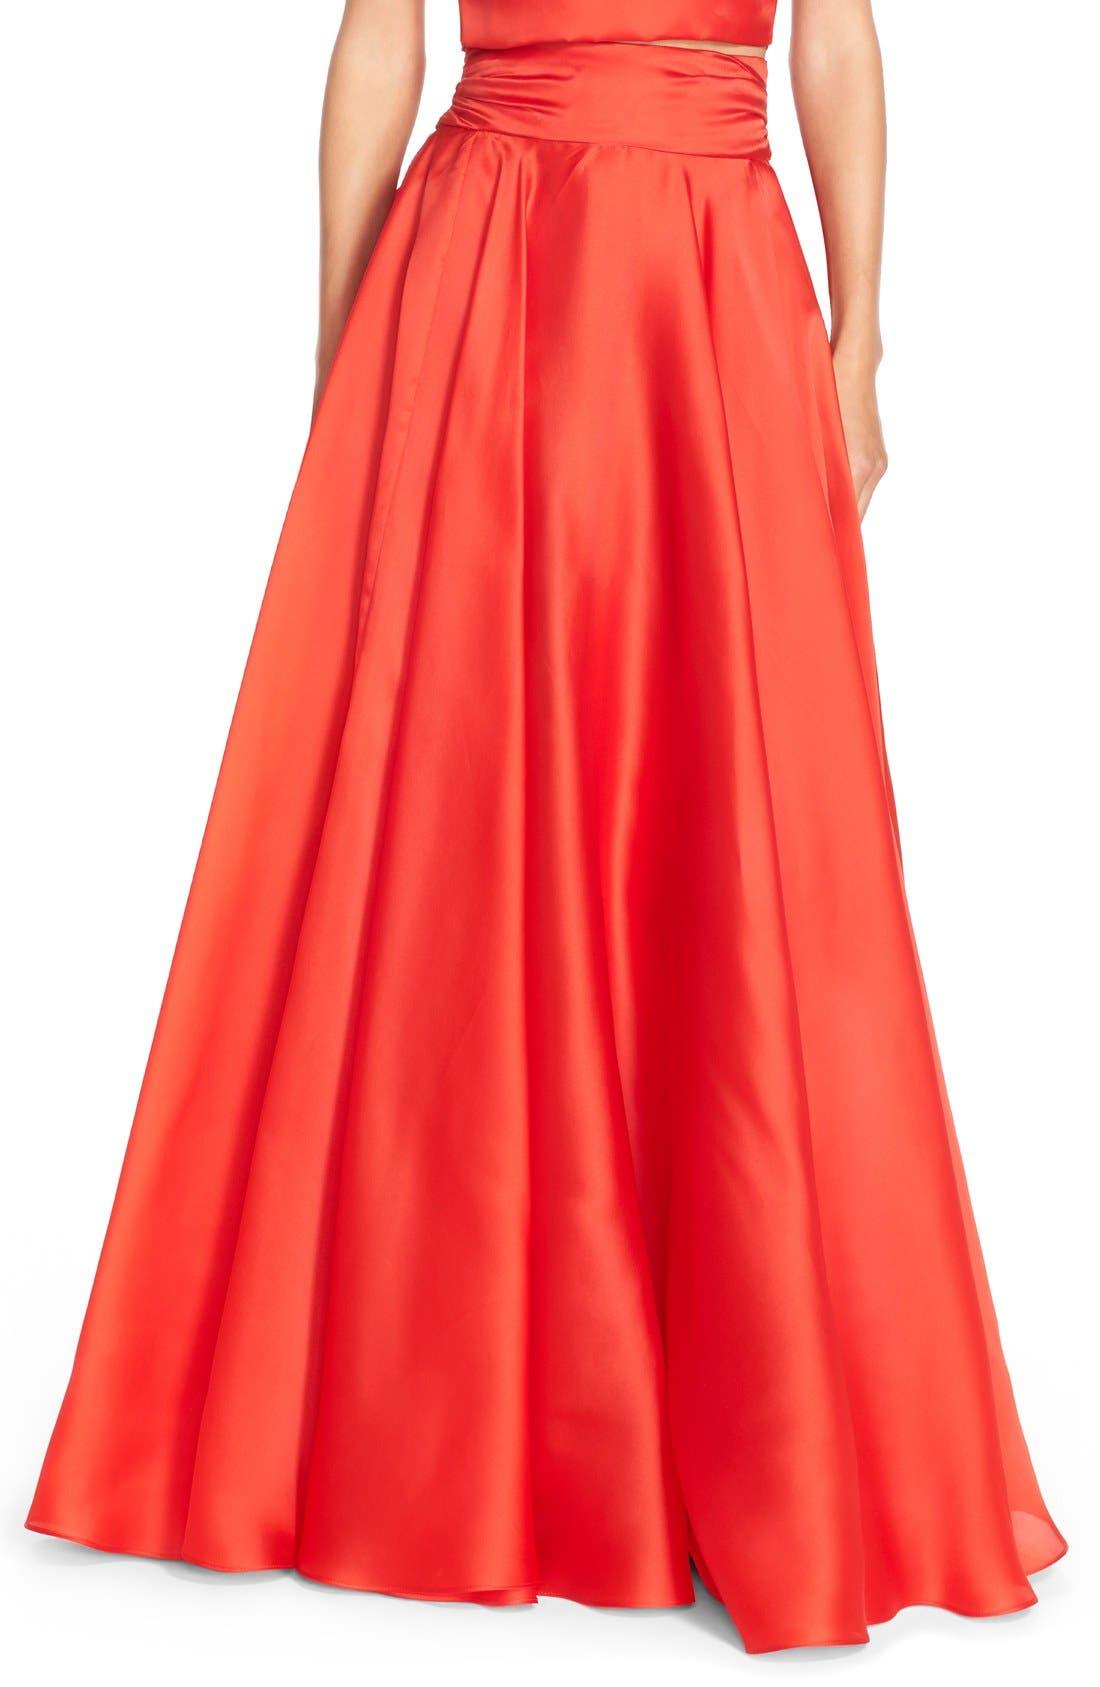 Alternate Image 1 Selected - Milly Silk Satin Bow Back Ball Skirt